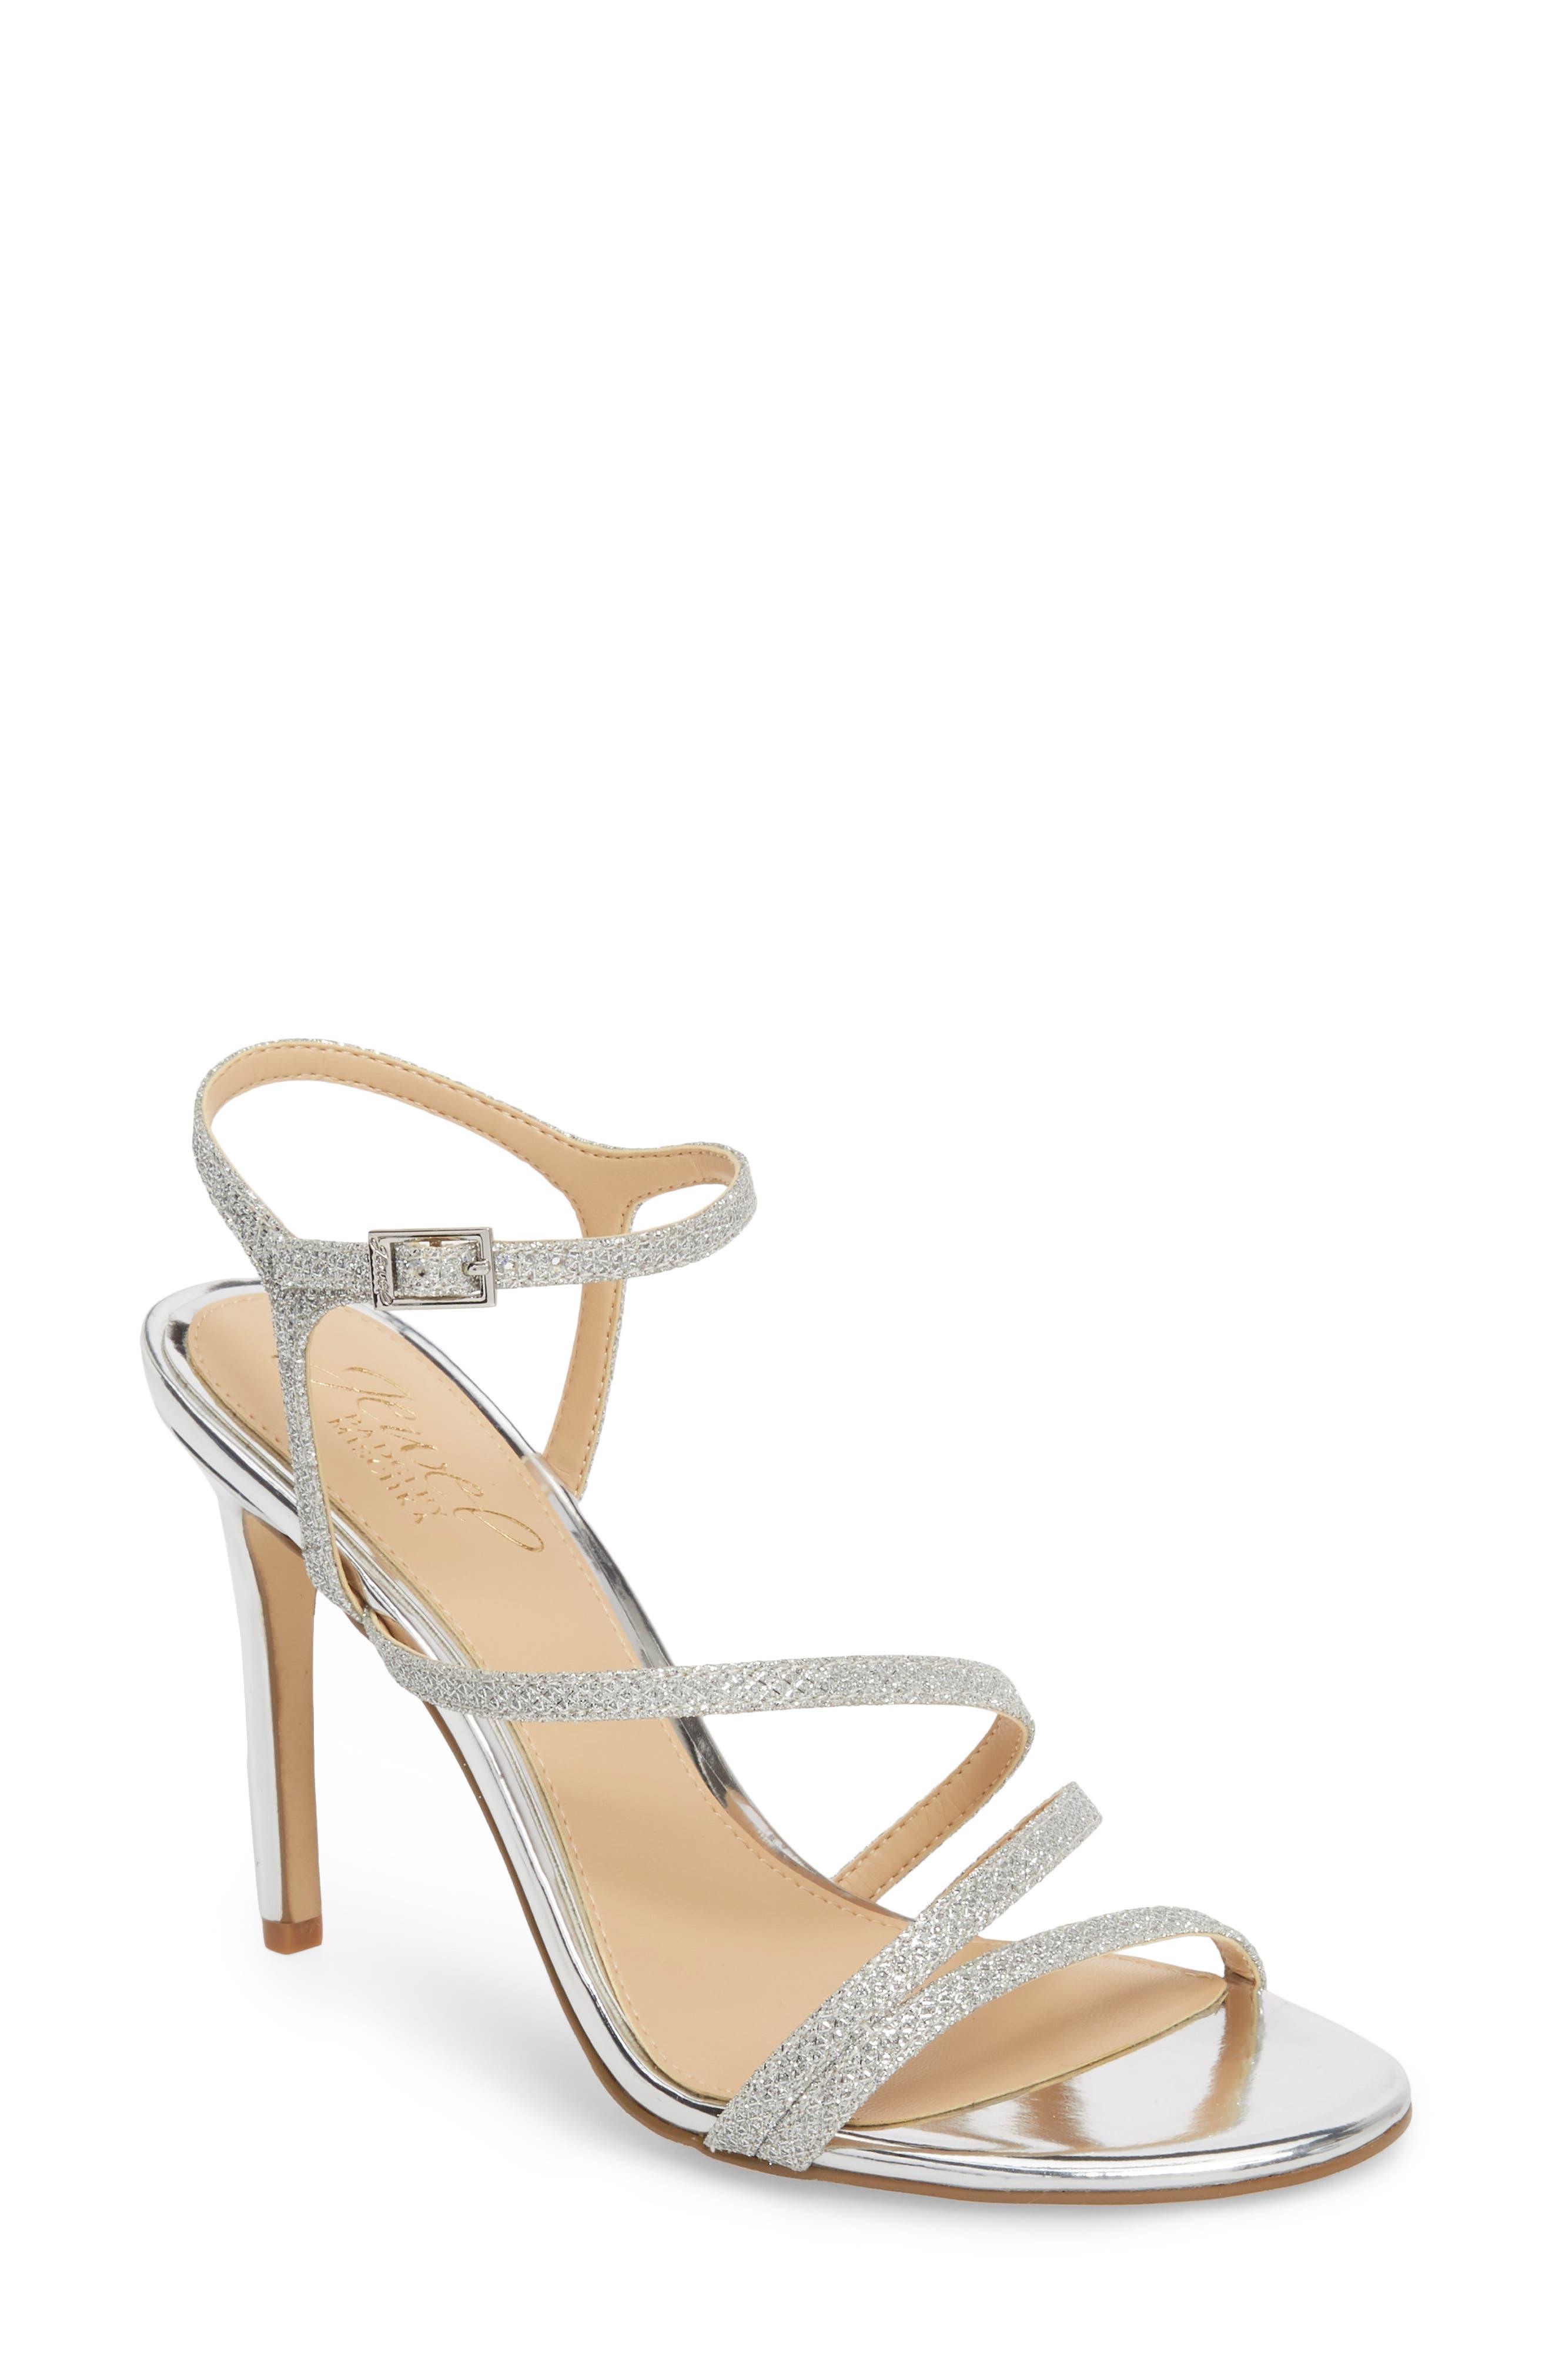 Jewel Badgley Mischka Maddison Sandal, Metallic